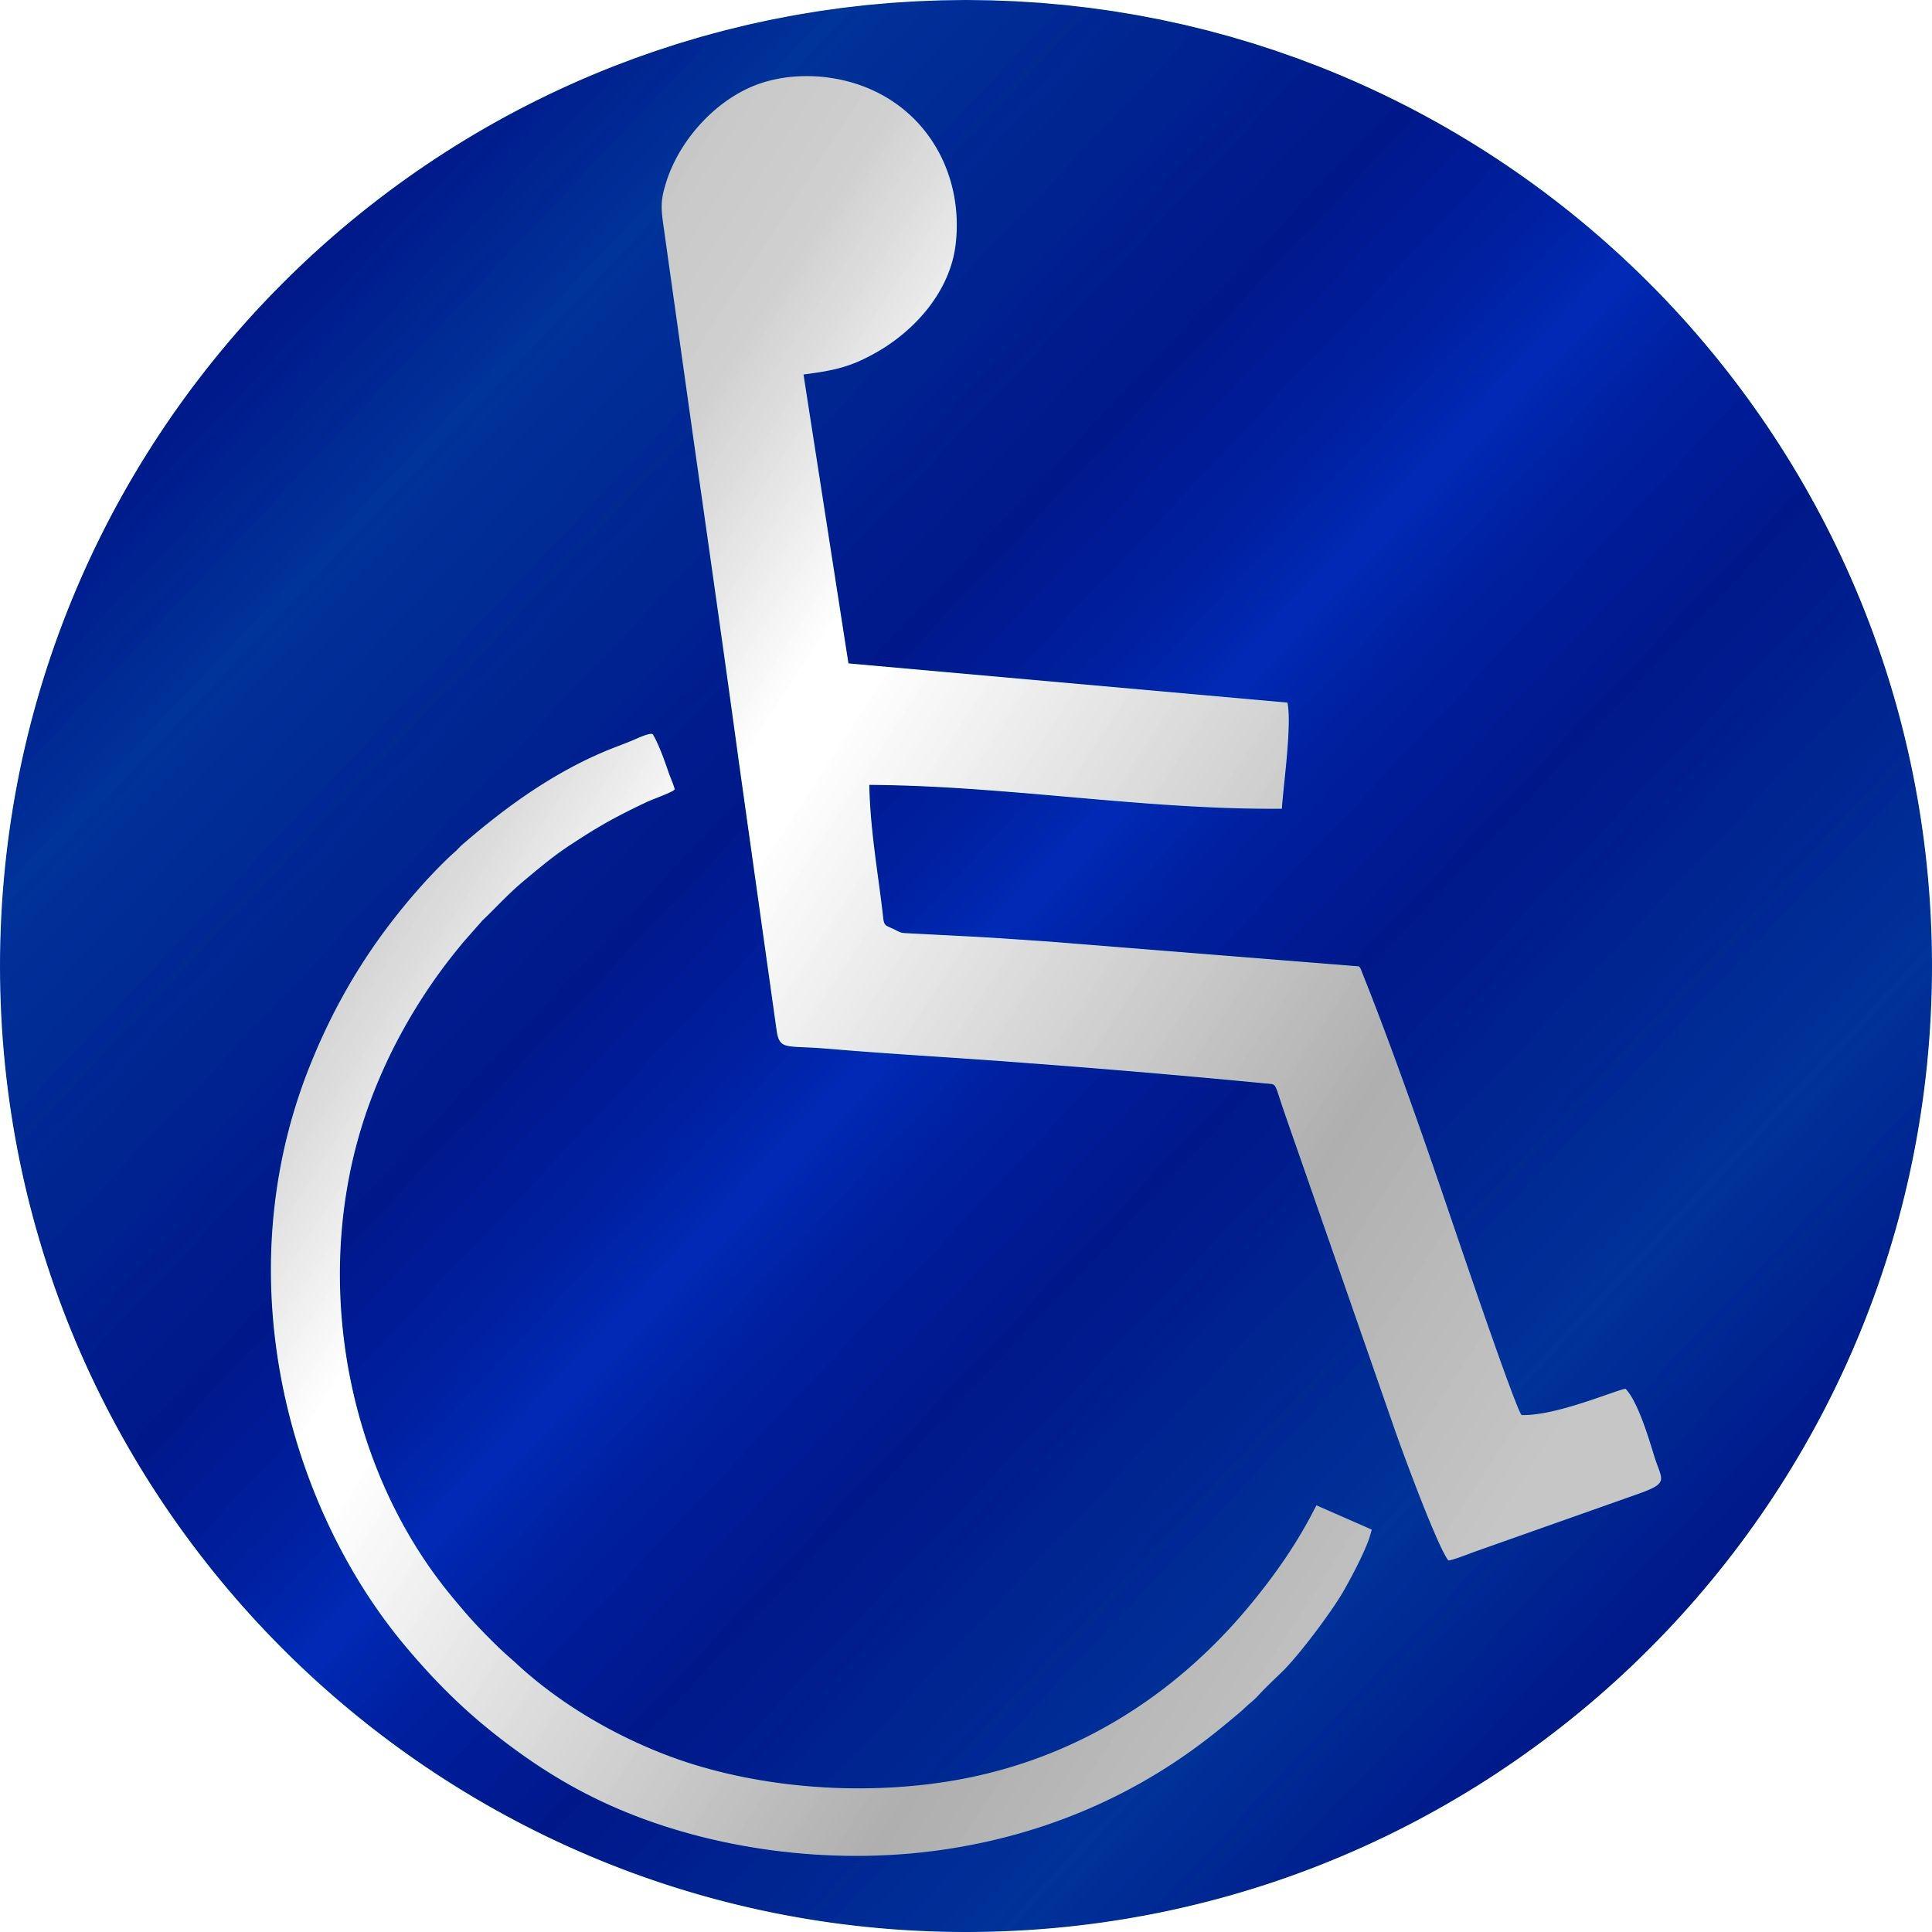 Sticker handicapped symbol blue reflective – Bild 1